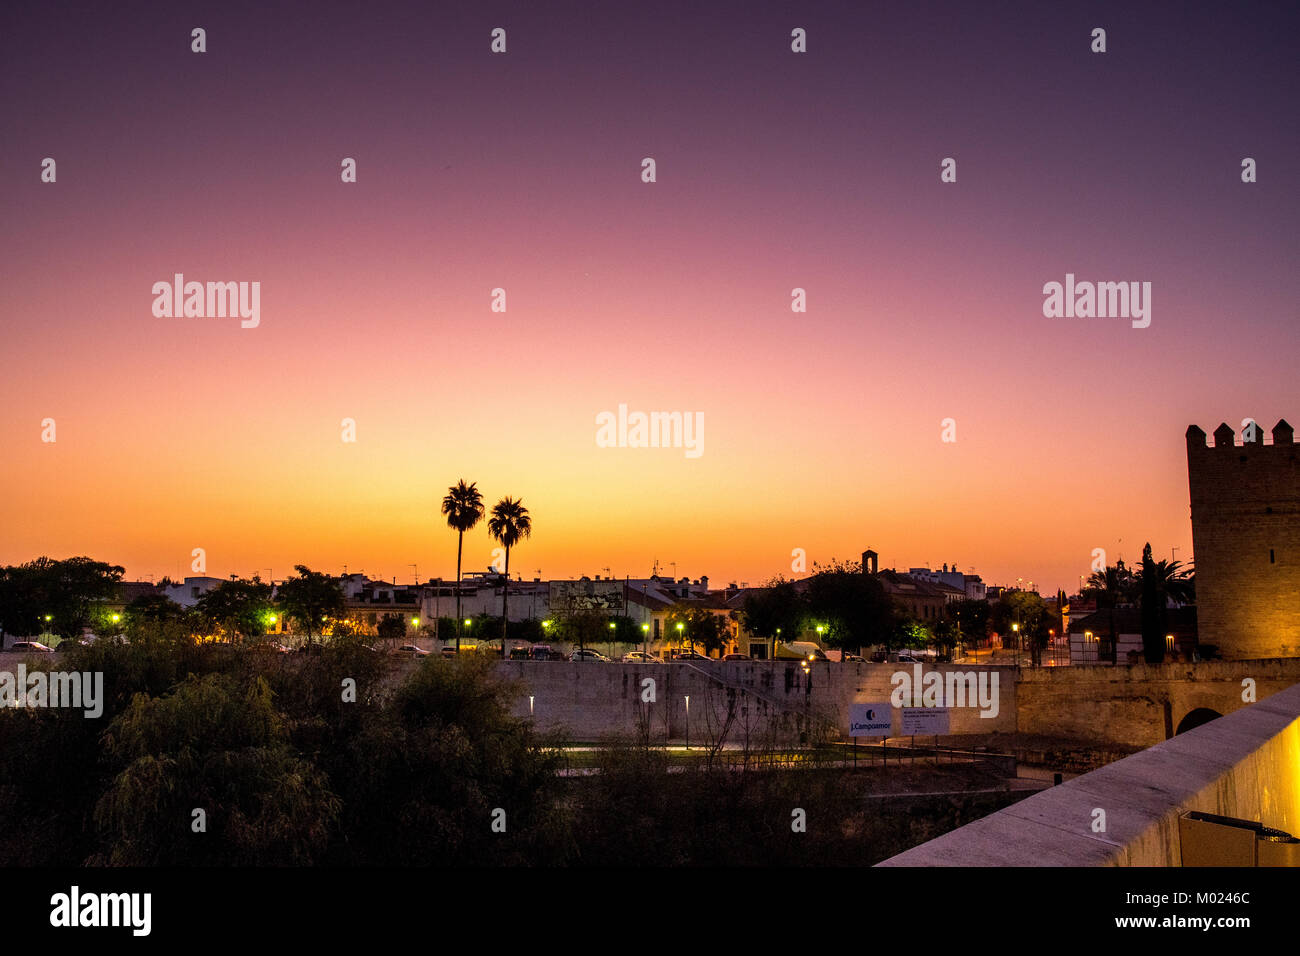 CORDOBA, ANDALUSIA / SPAIN - OCTOBER 14 2017: SUNRISE VIEW FROM ROMAN BRIDGE Stock Photo